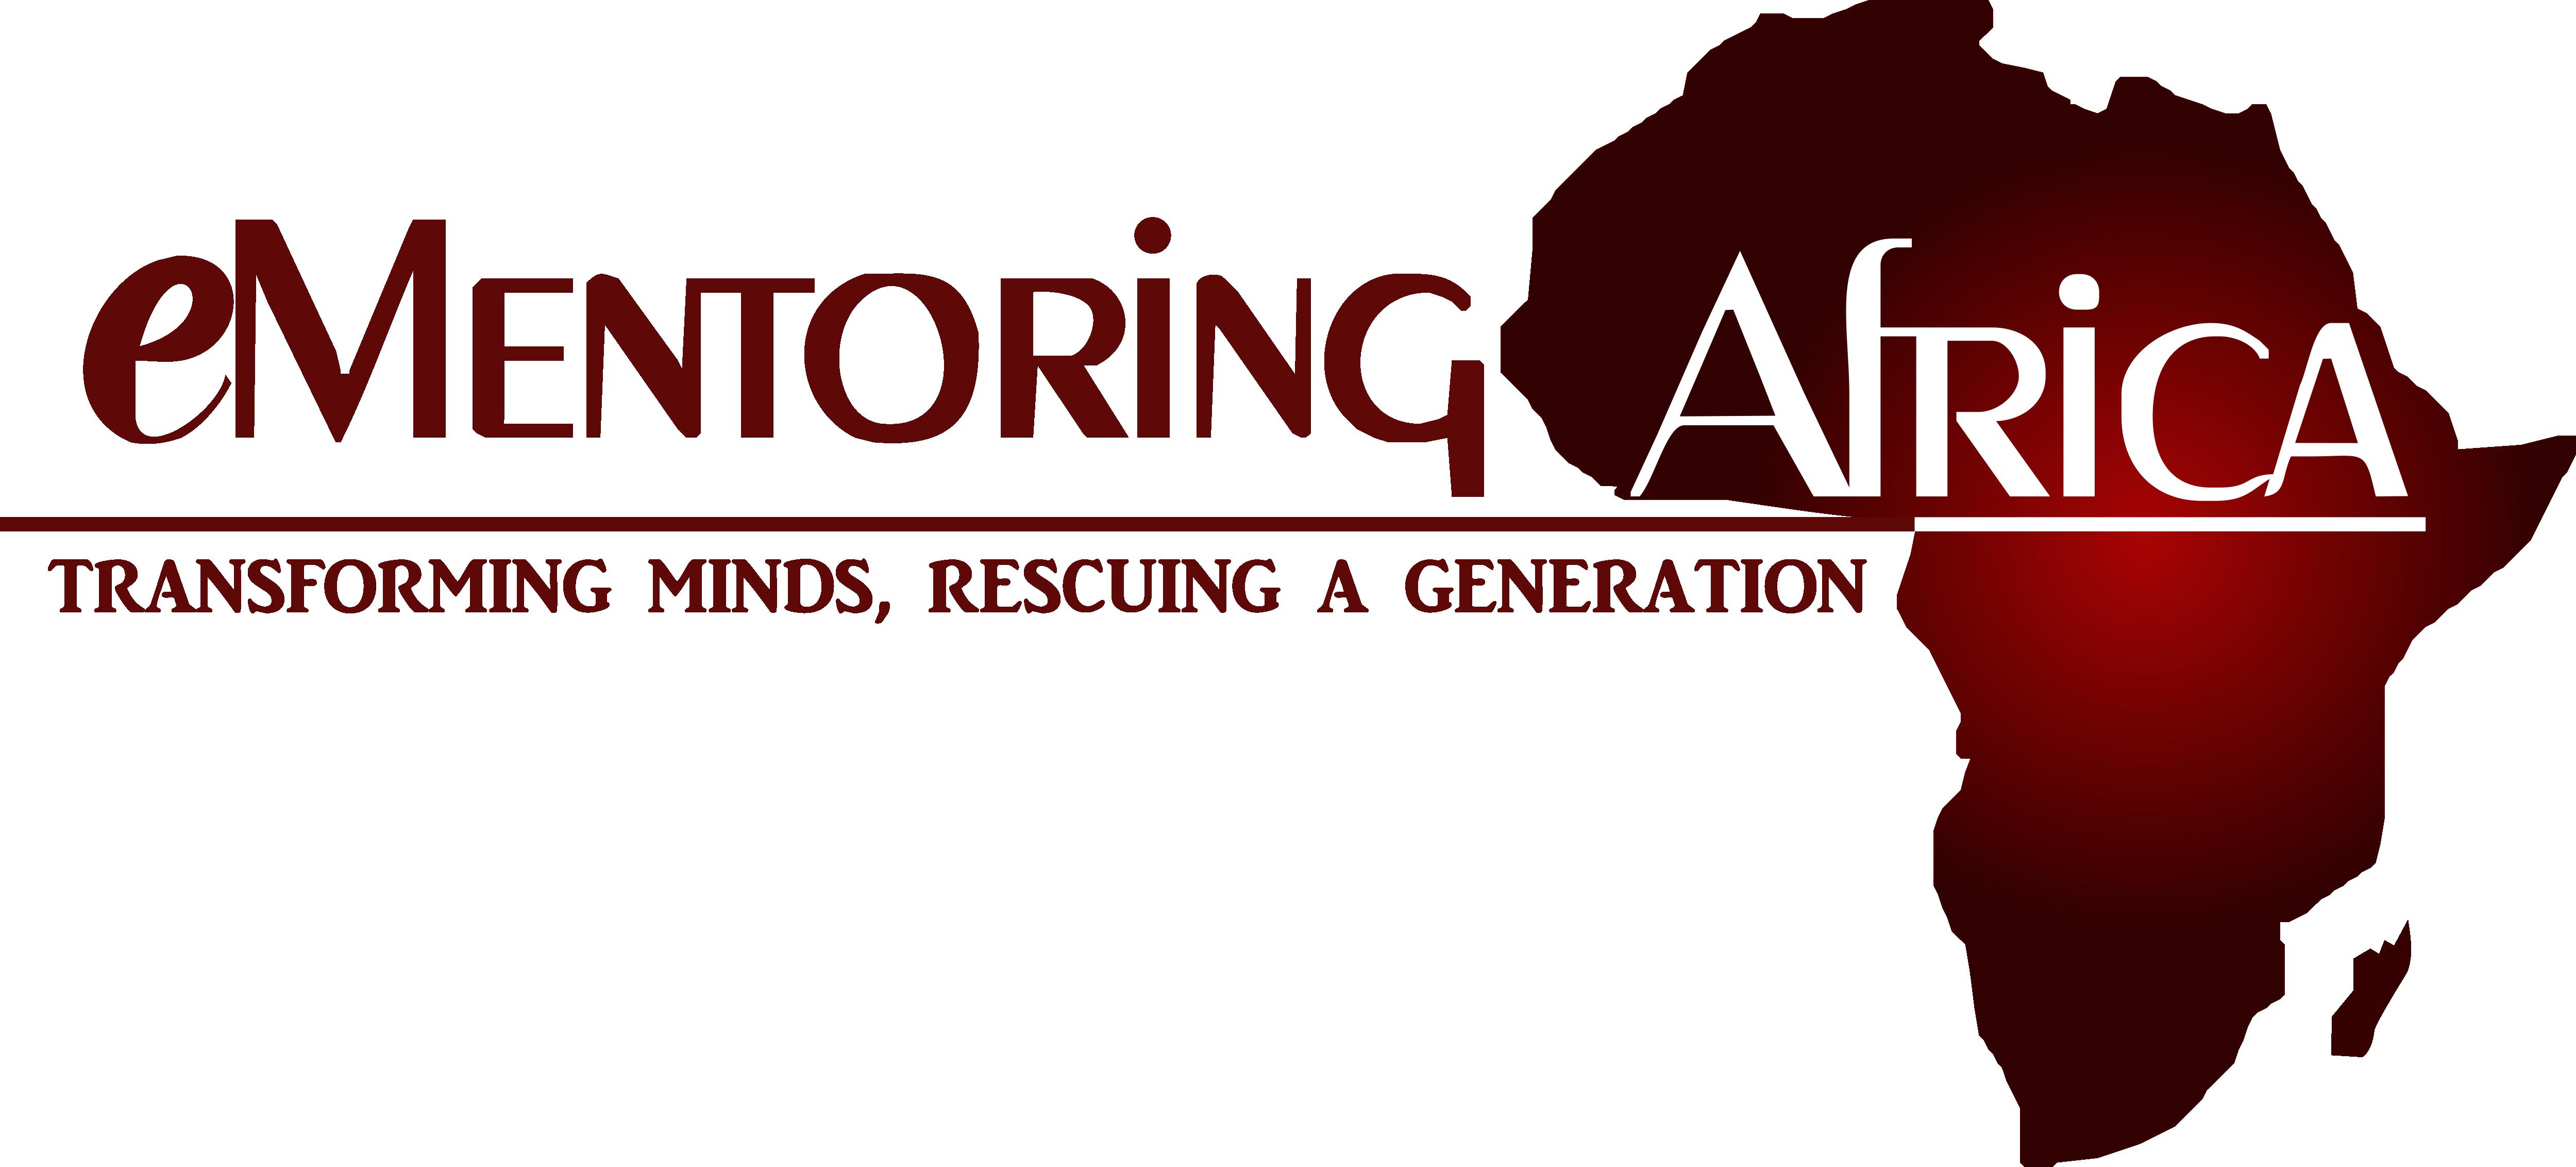 eMentoring Africa